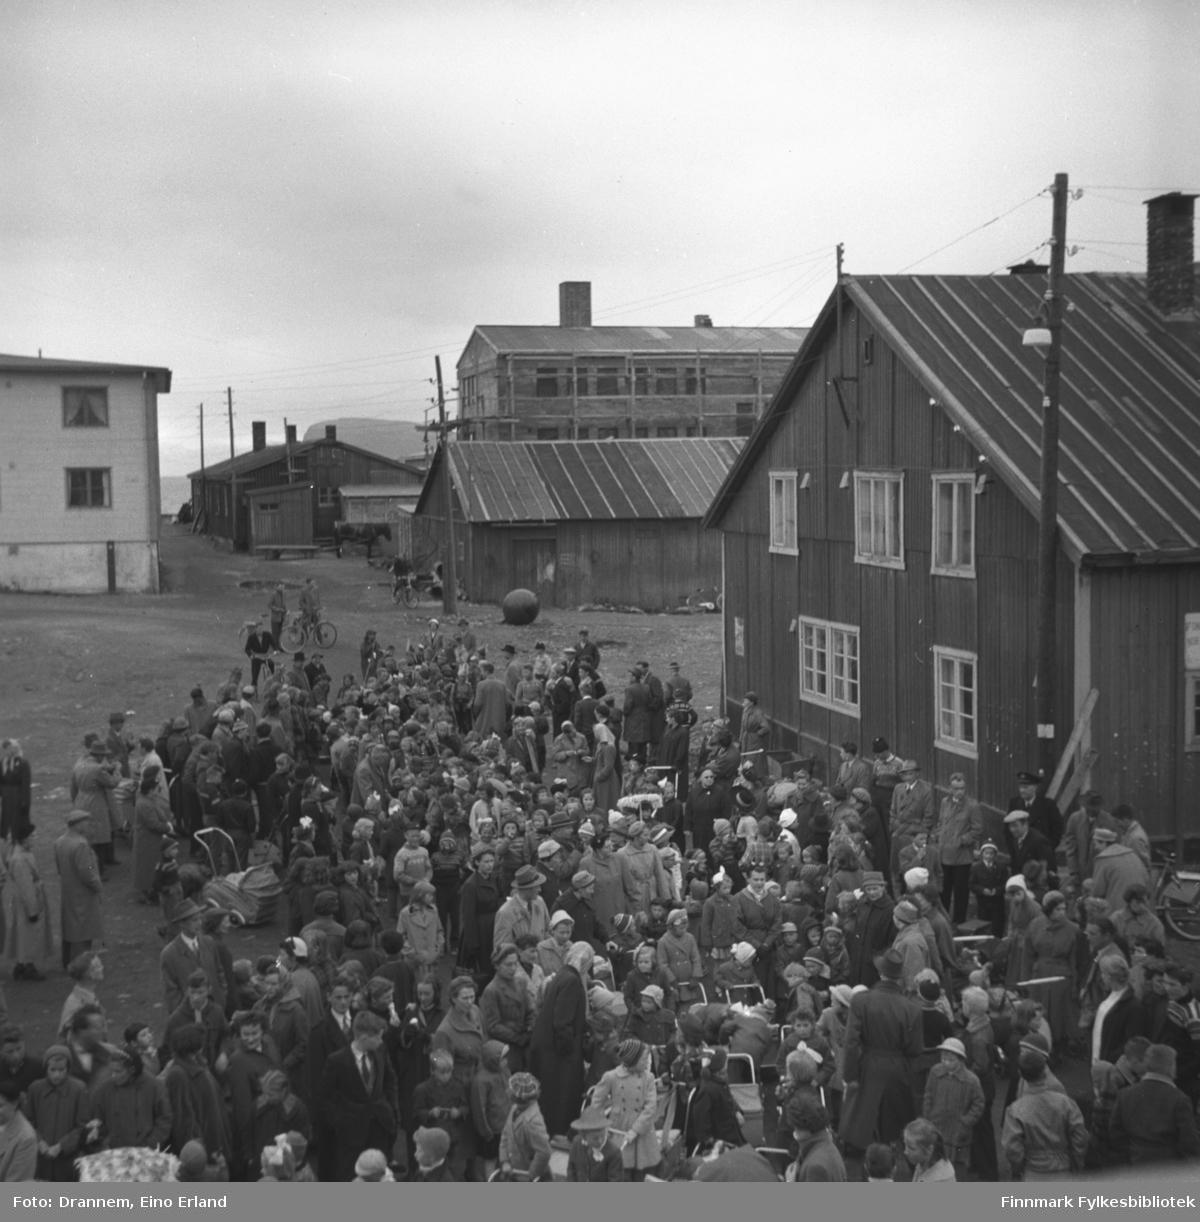 Masse folk samlet i Hammerfest sentrum (Barnas dag)